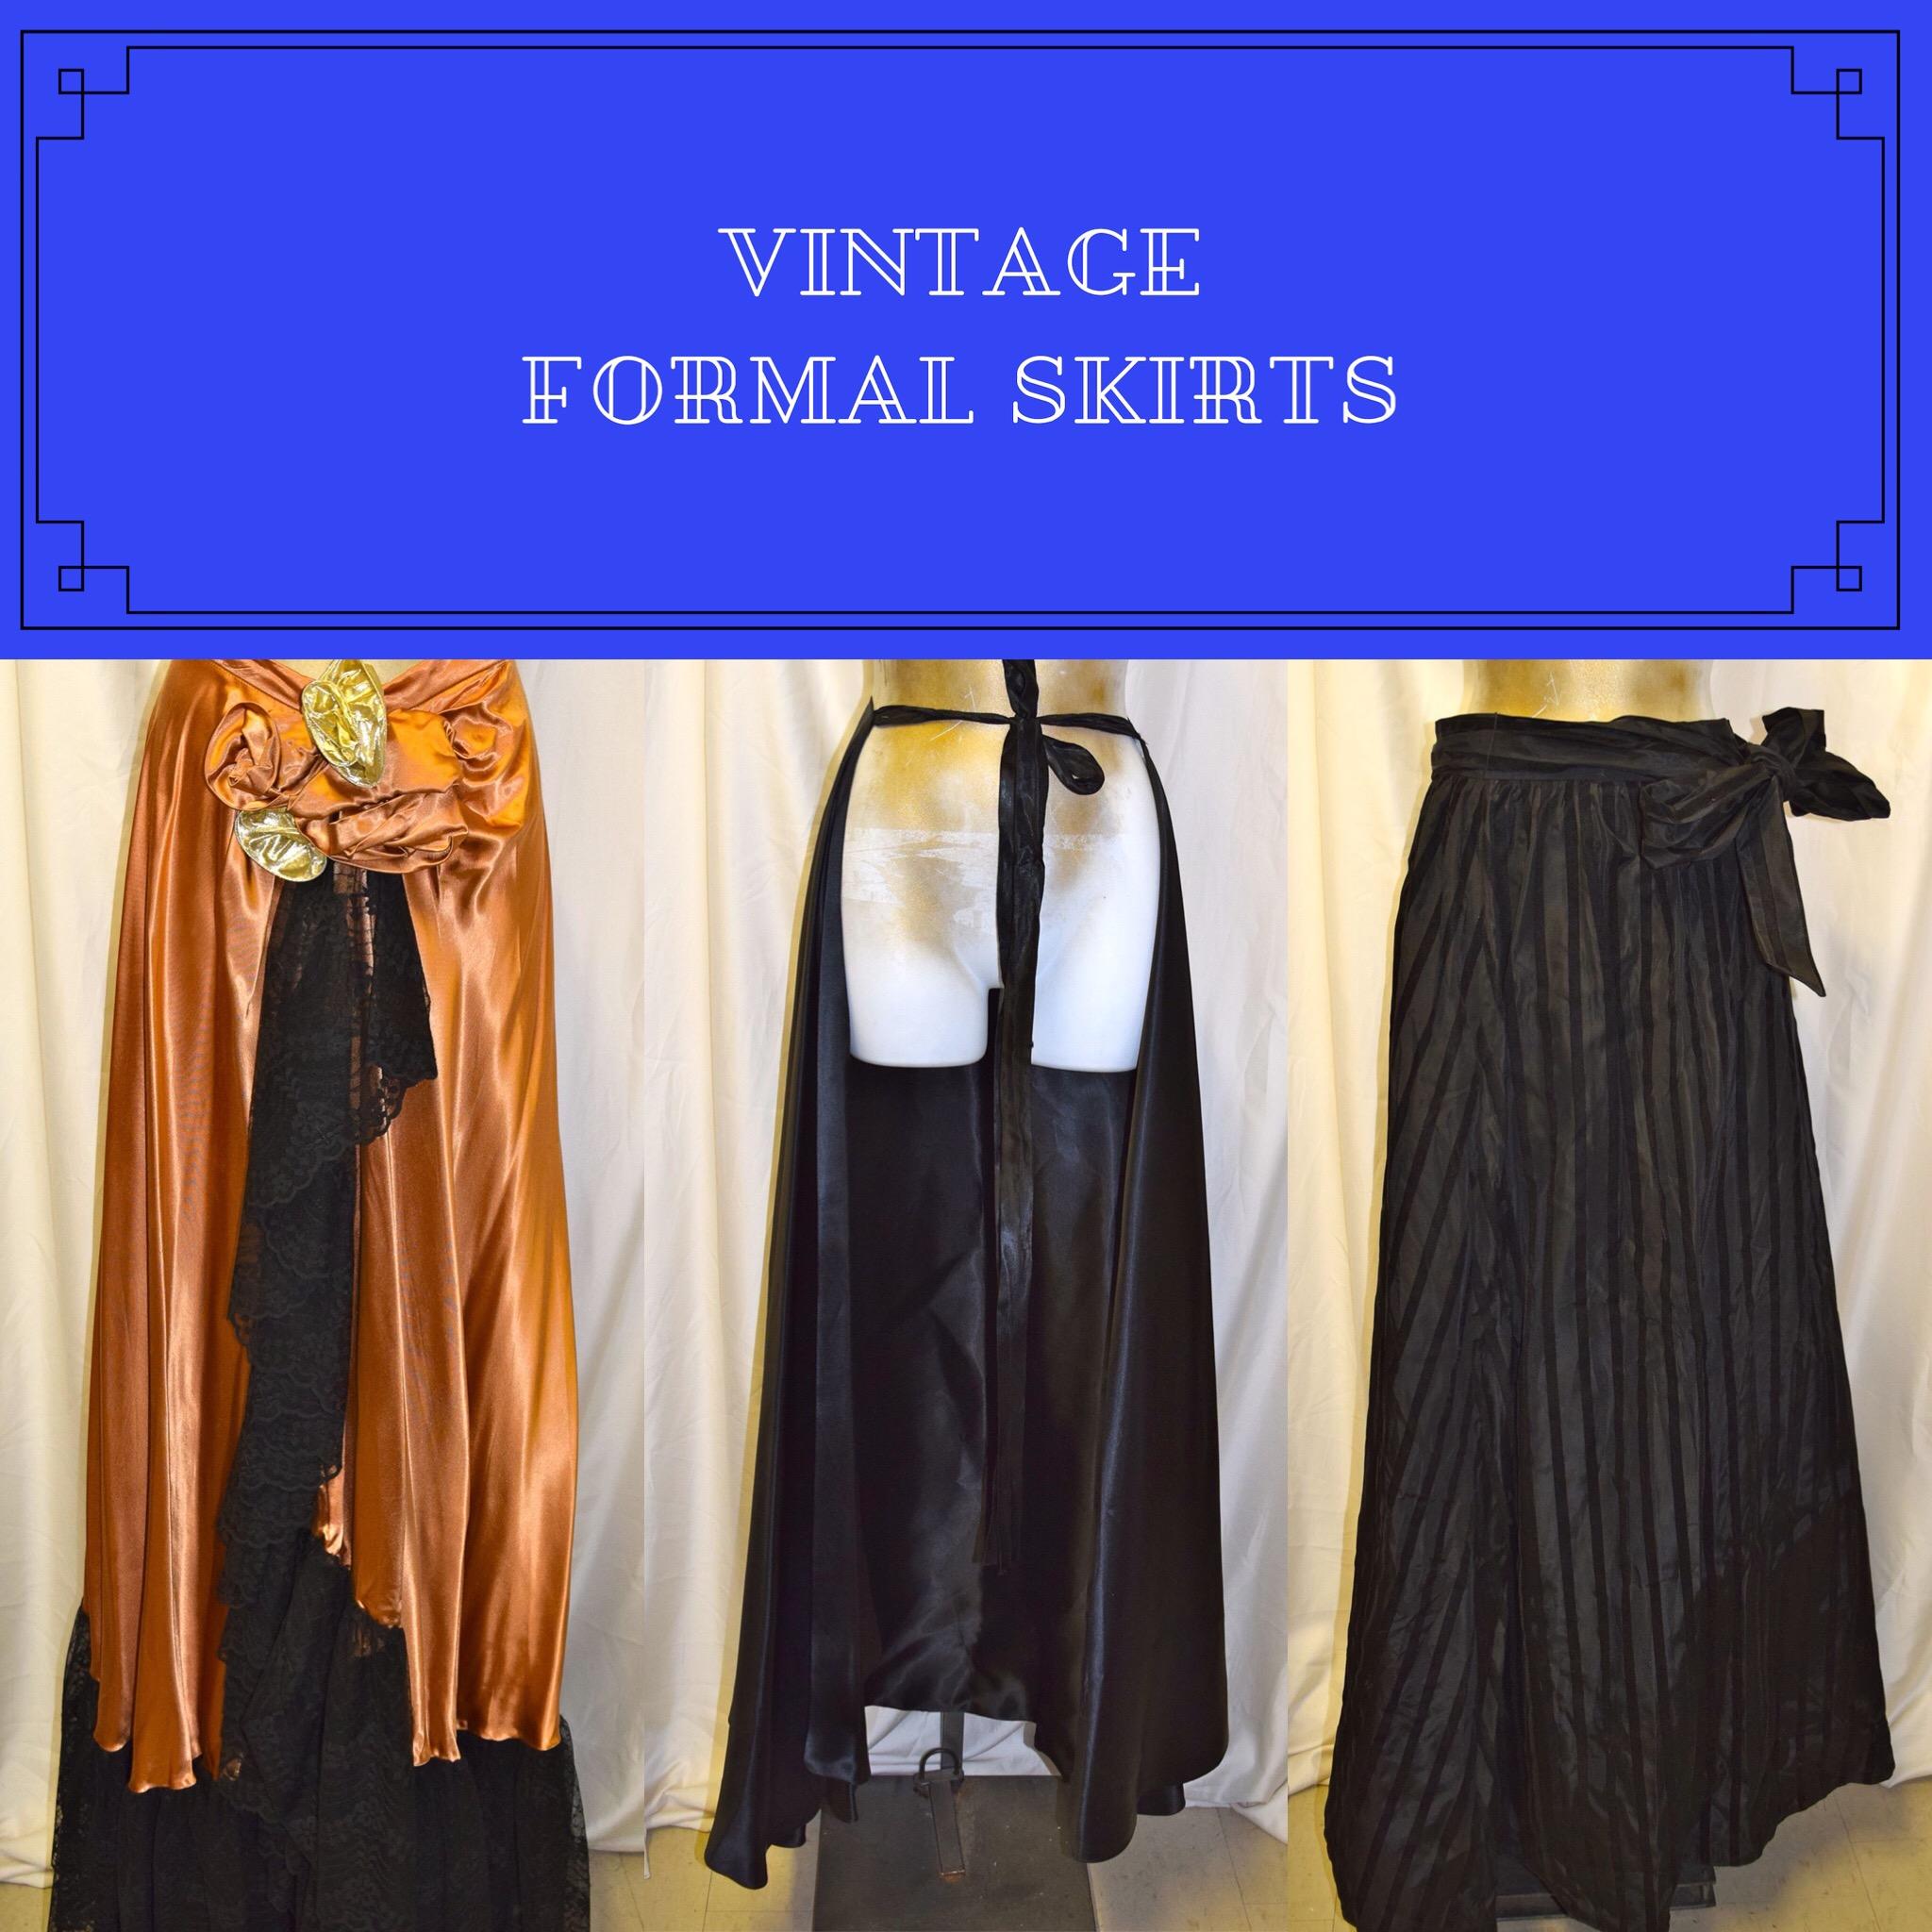 Vintage & New Skirts